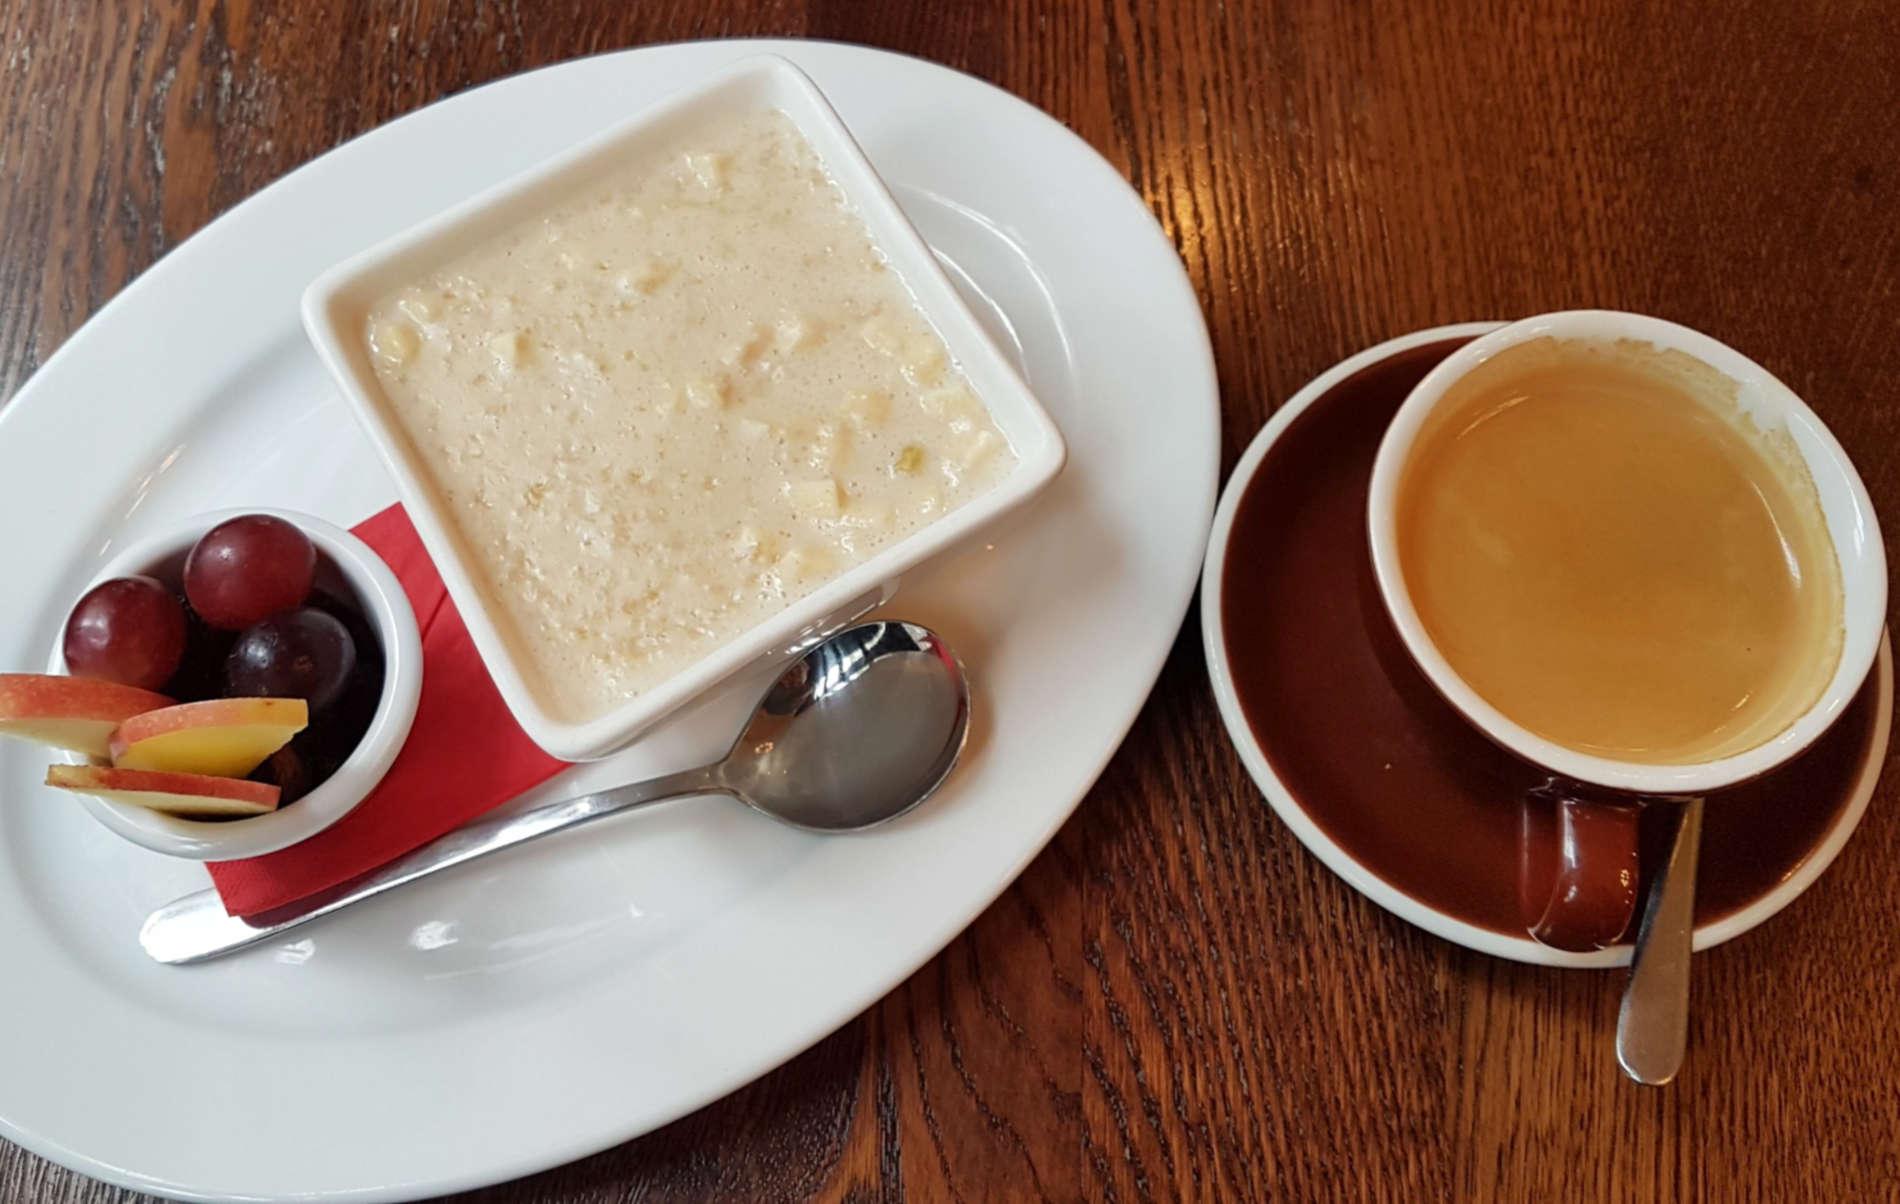 Leuven porridge and coffee